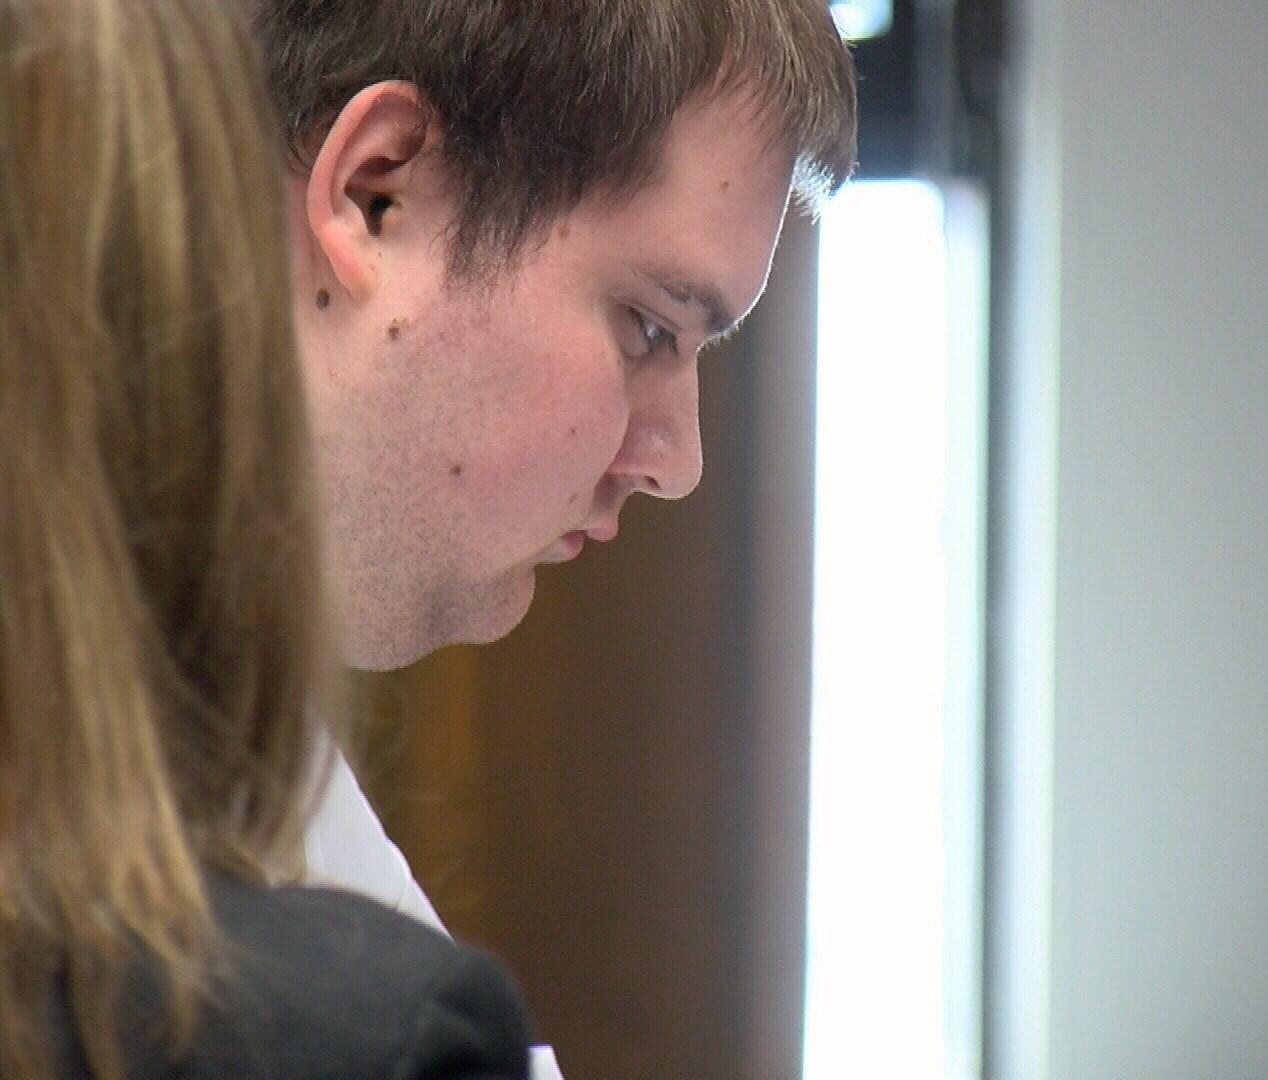 Christopher Montz in Court, August 2nd, 2018